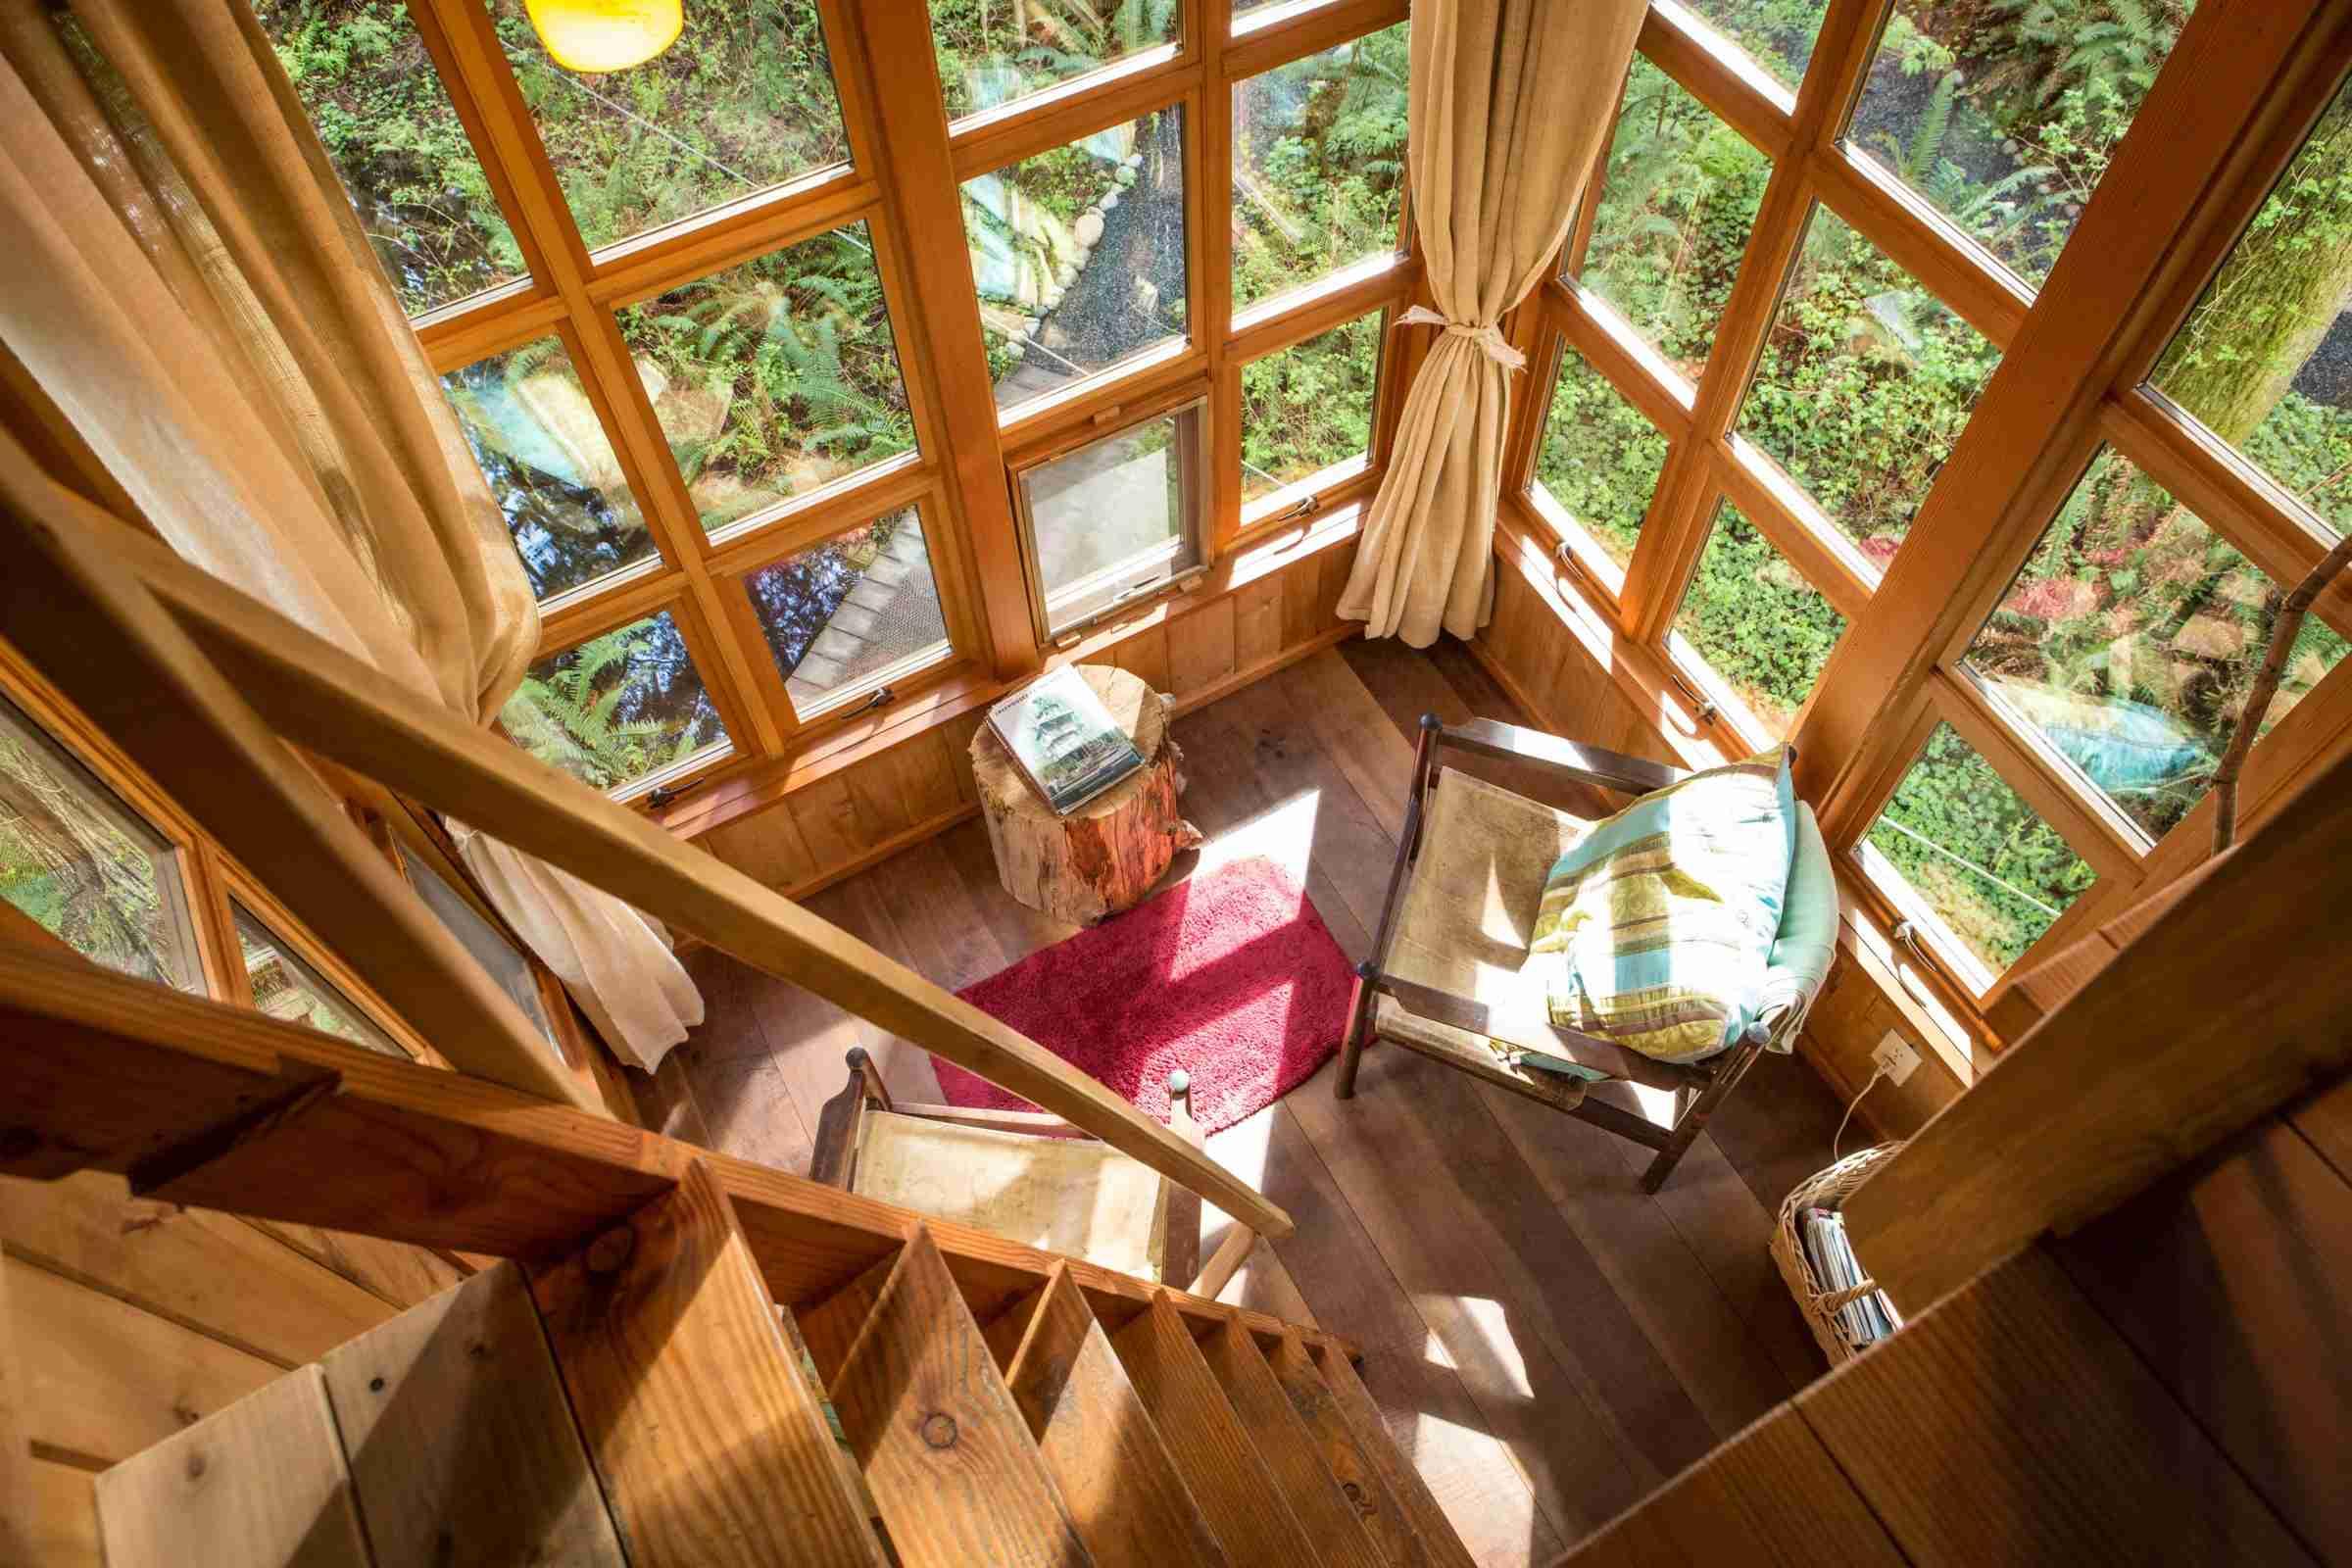 Trillium features a loft style design. Photo courtesy of Adam Crowley.